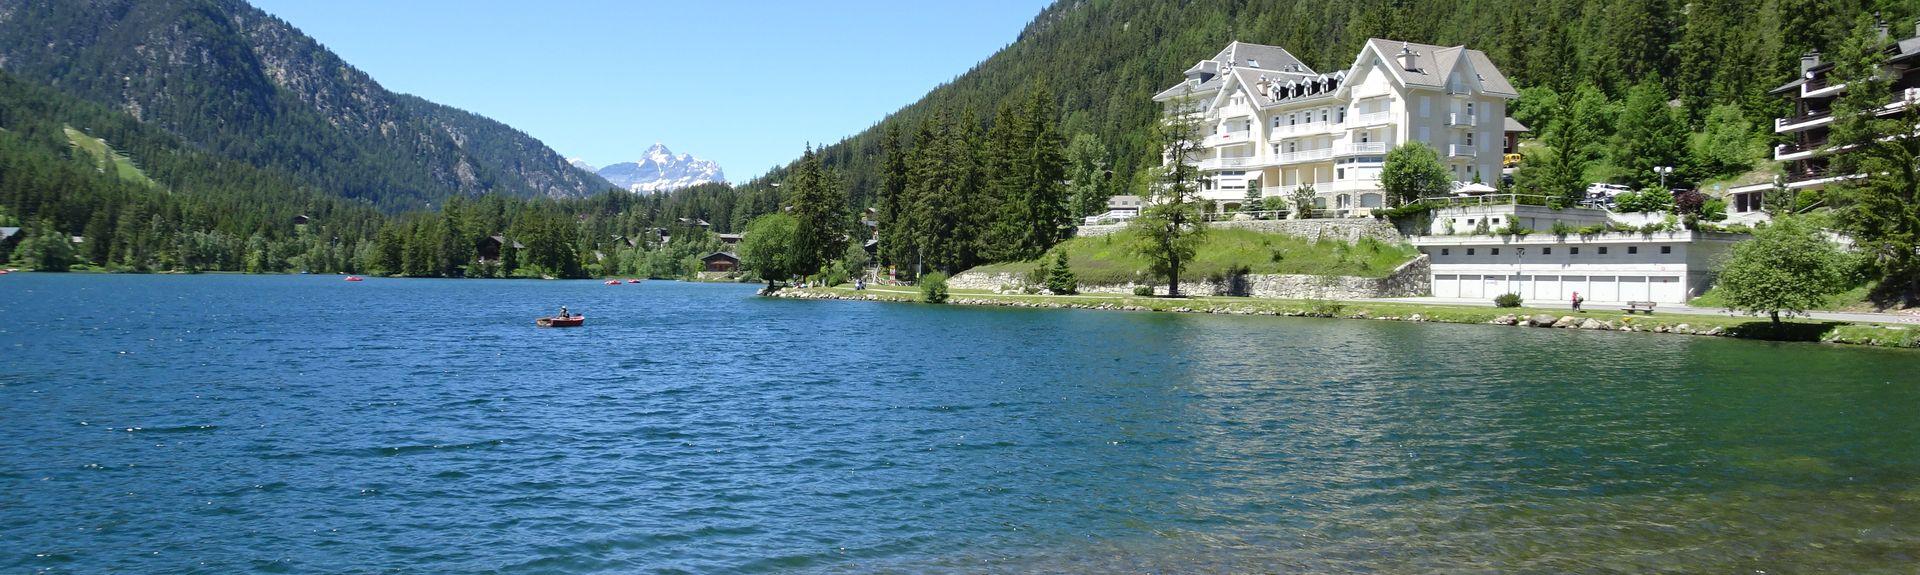 La Fouly, Orsières, Wallis, Schweiz